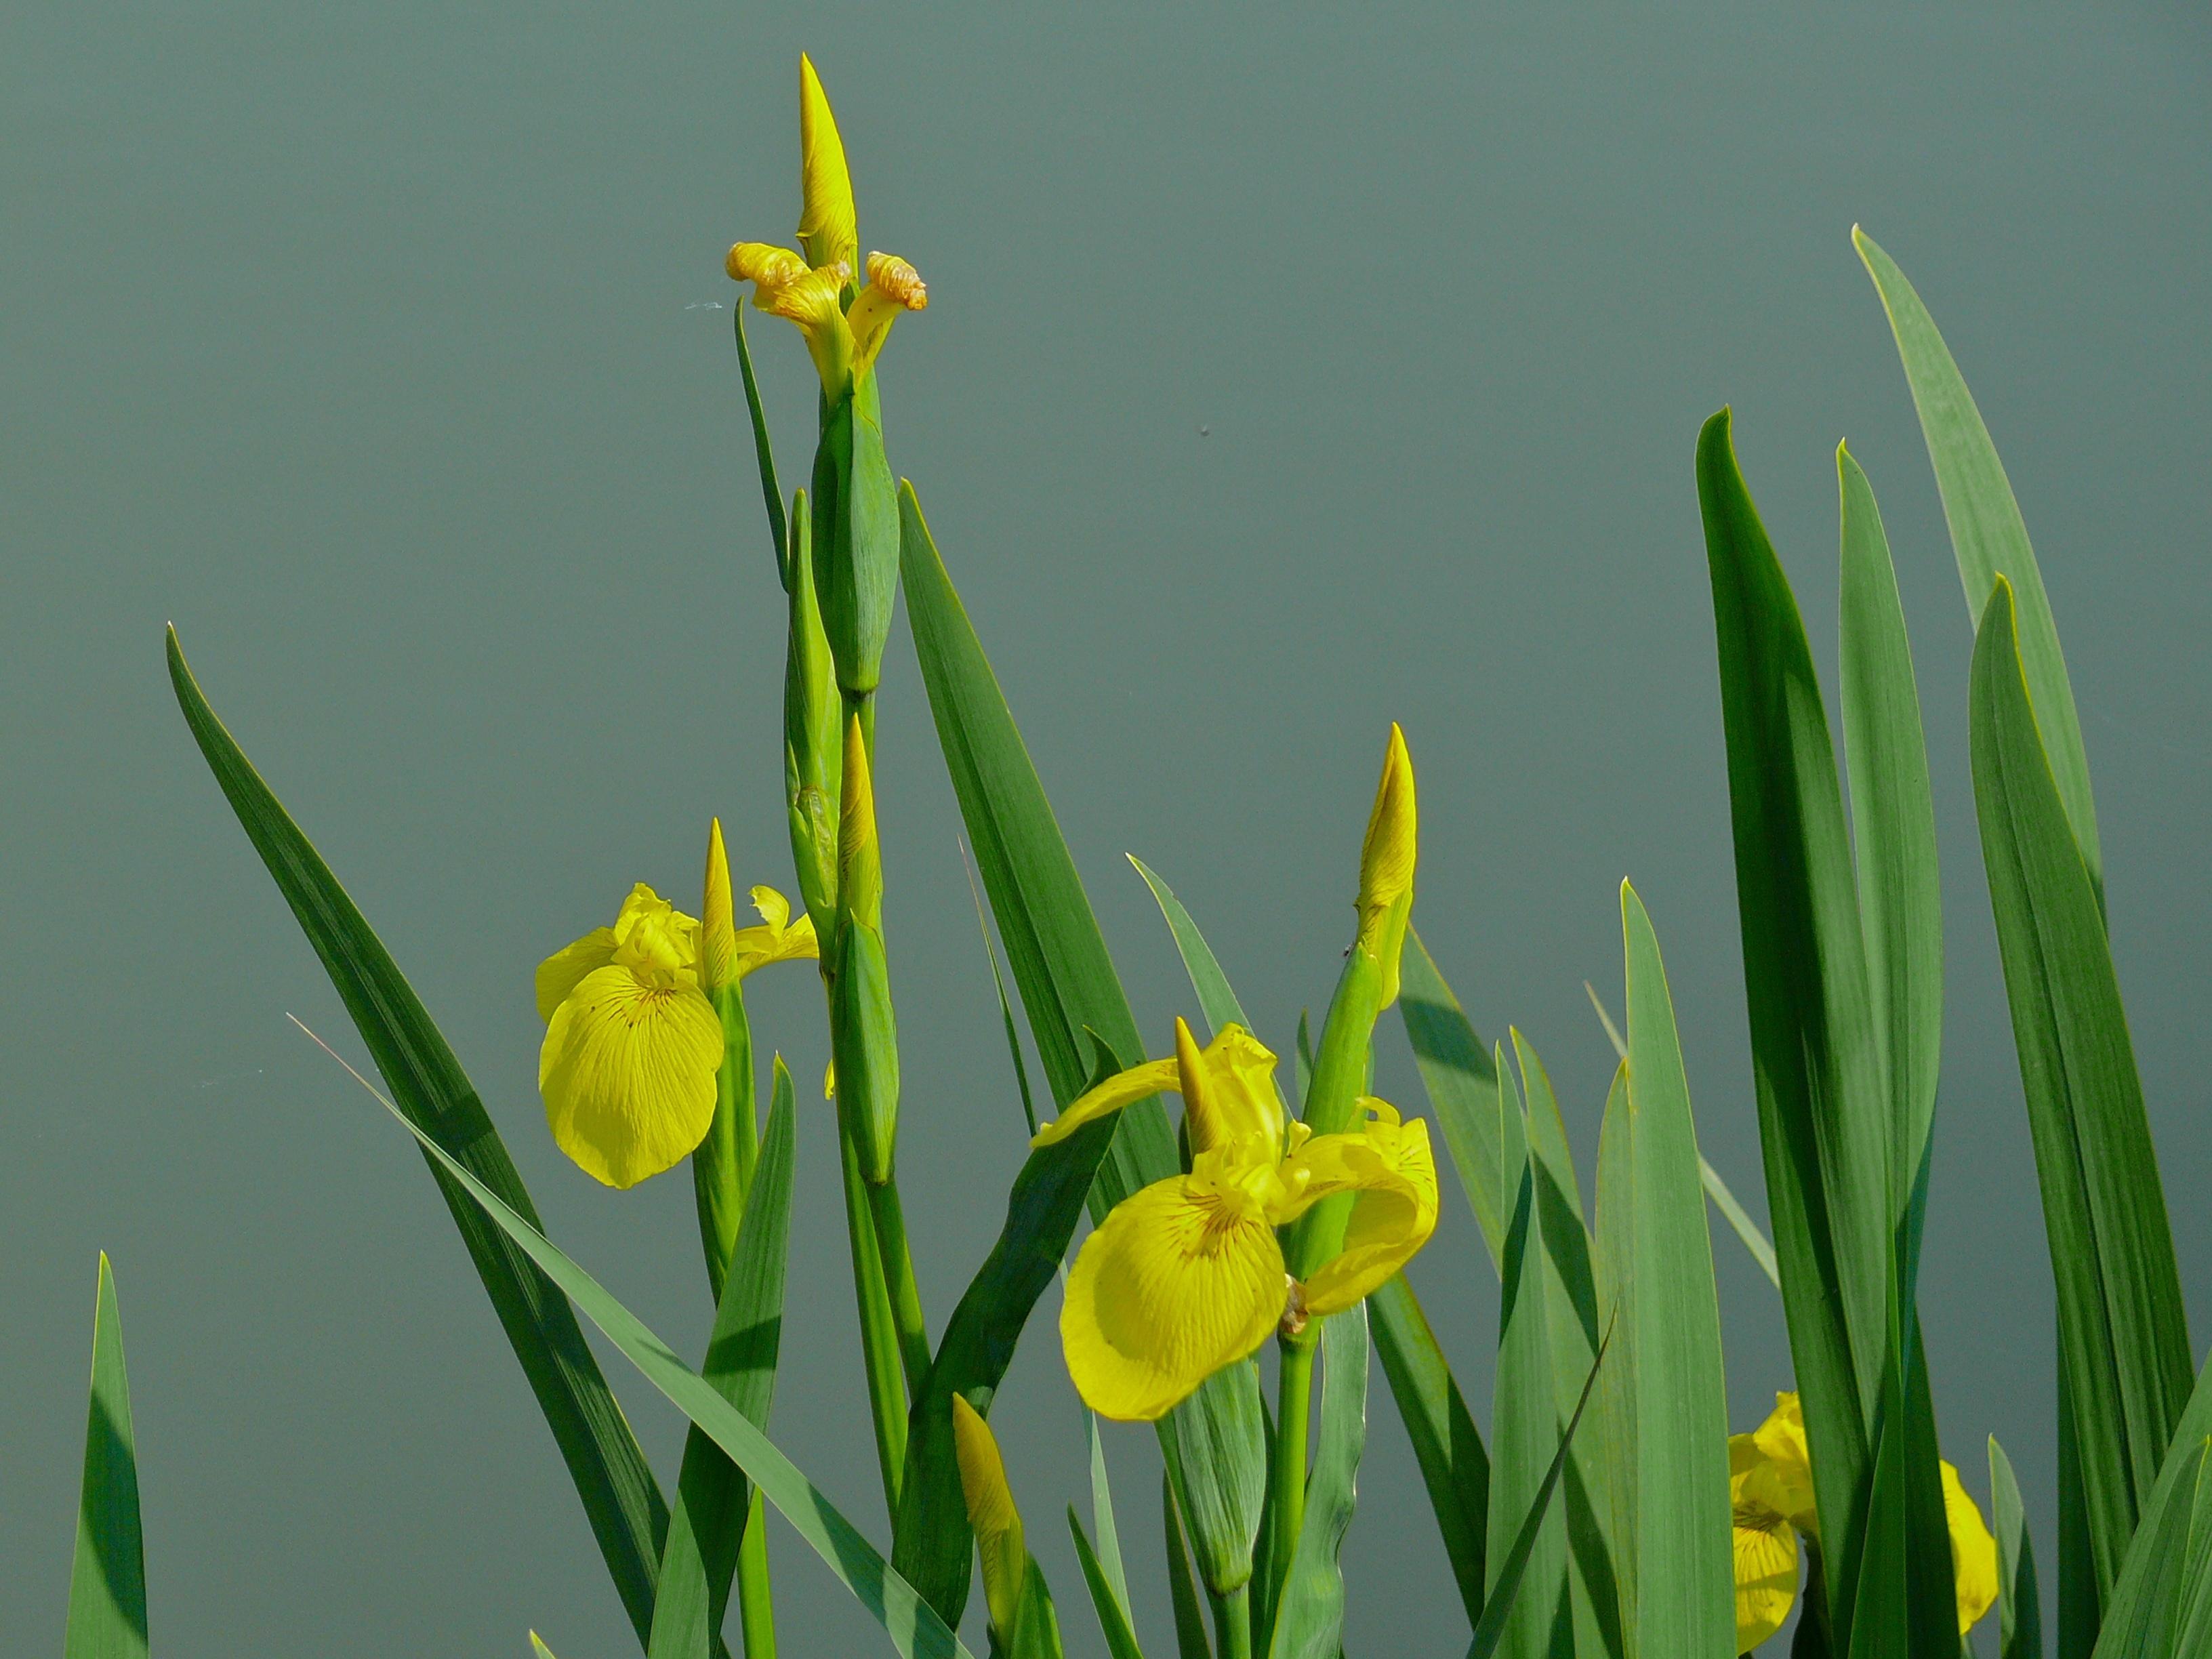 Image of yellow flag, yellow iris